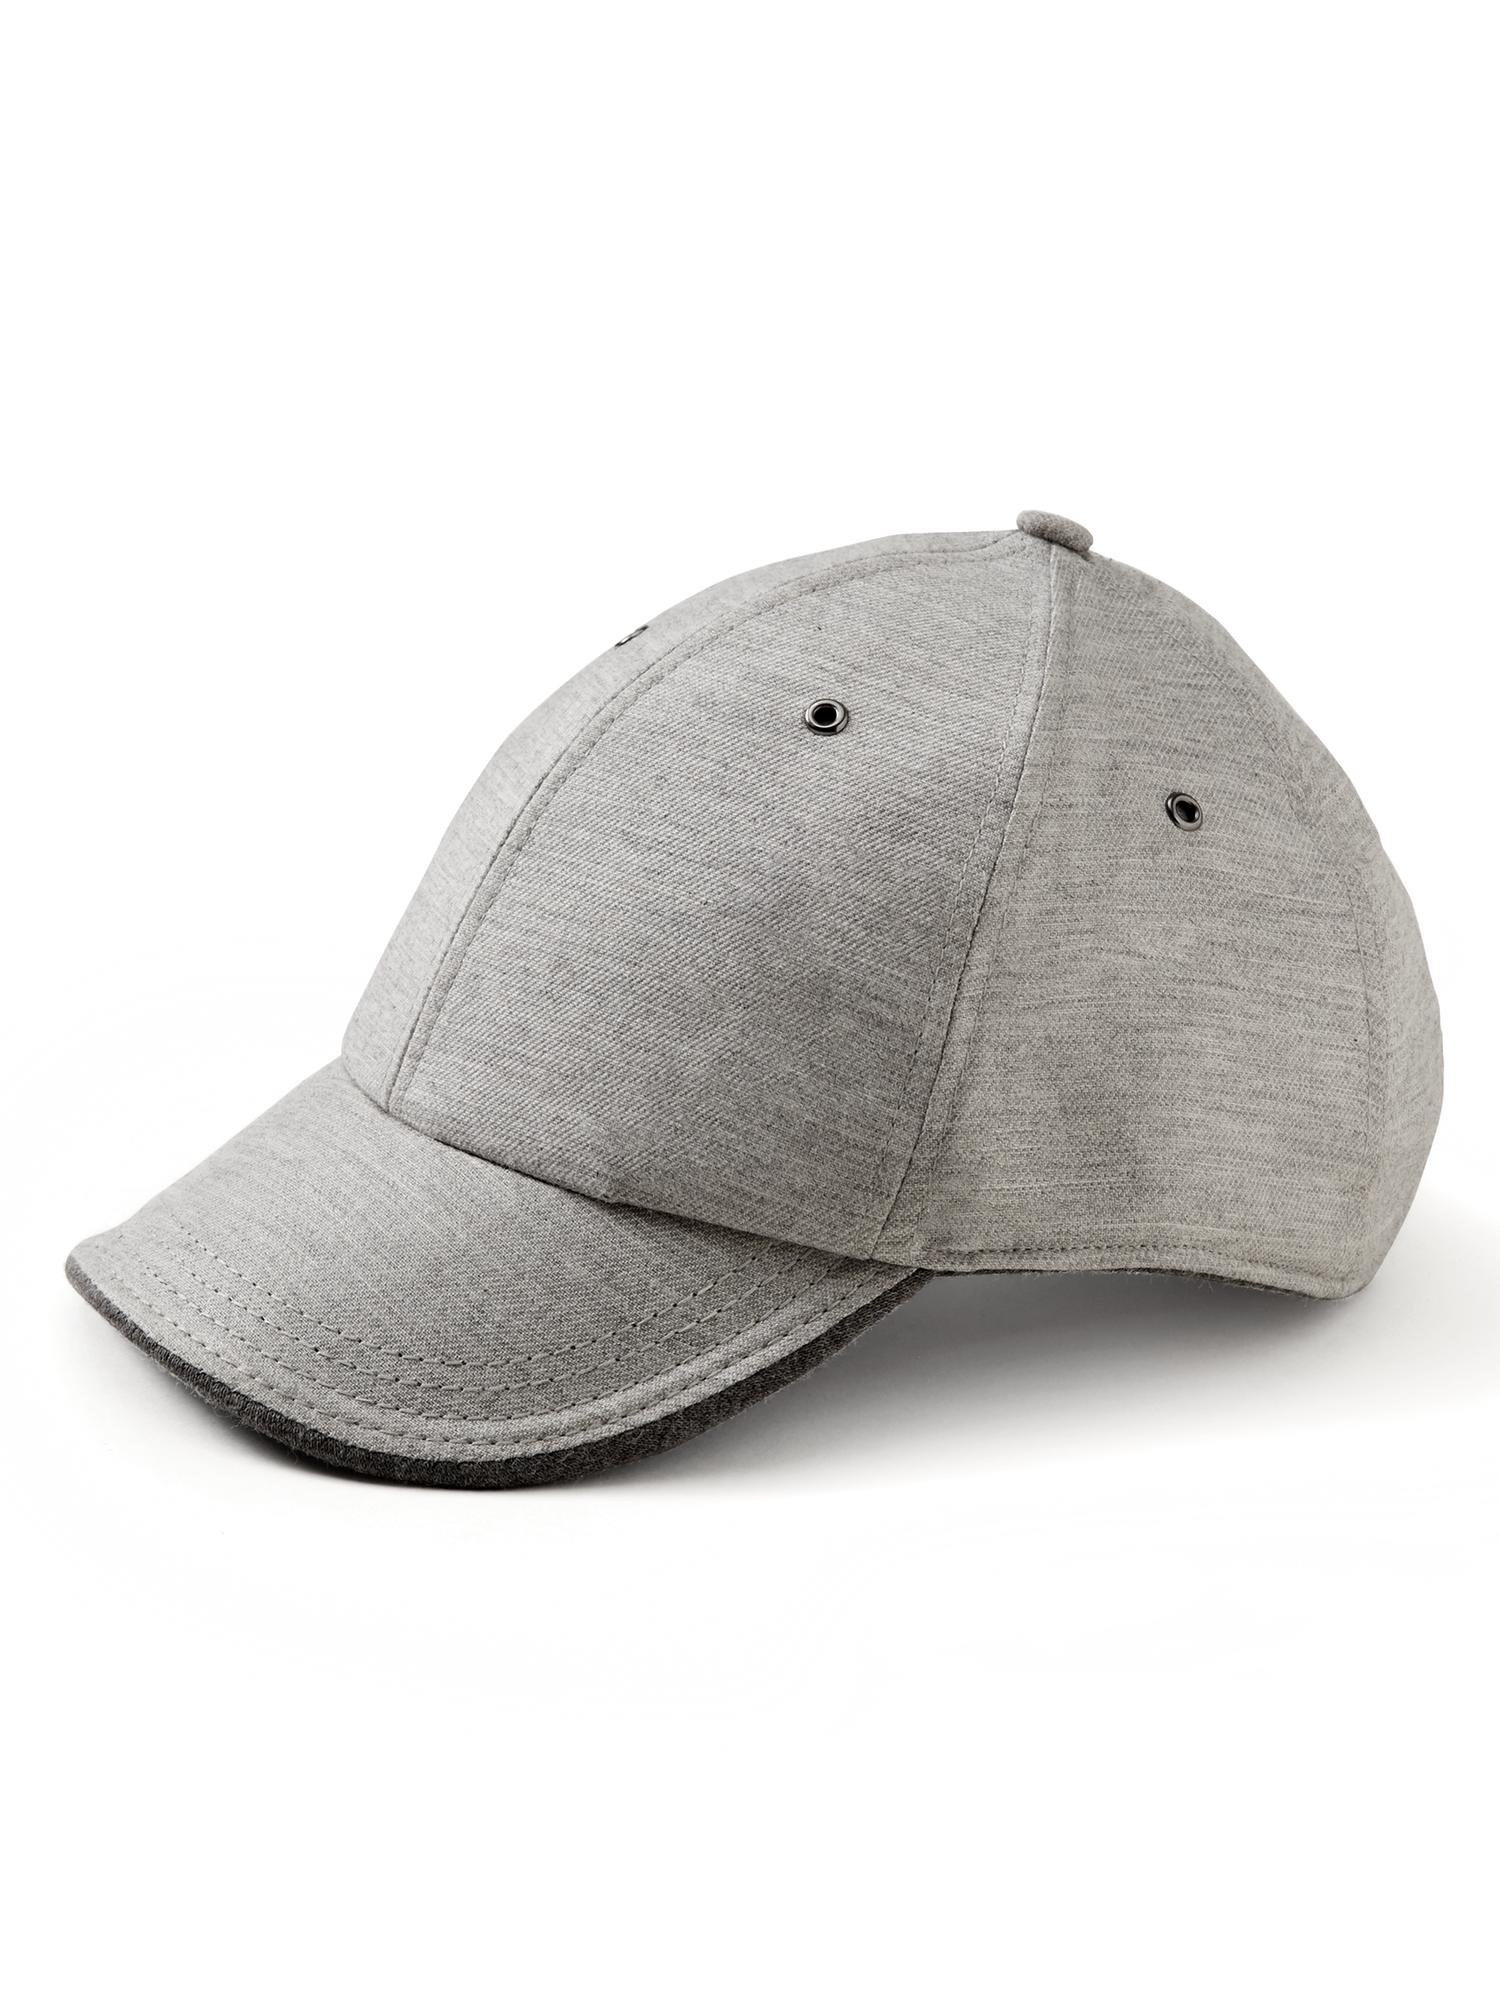 c7b9b7173 Lyst - Banana Republic Tipped Baseball Cap in Gray for Men